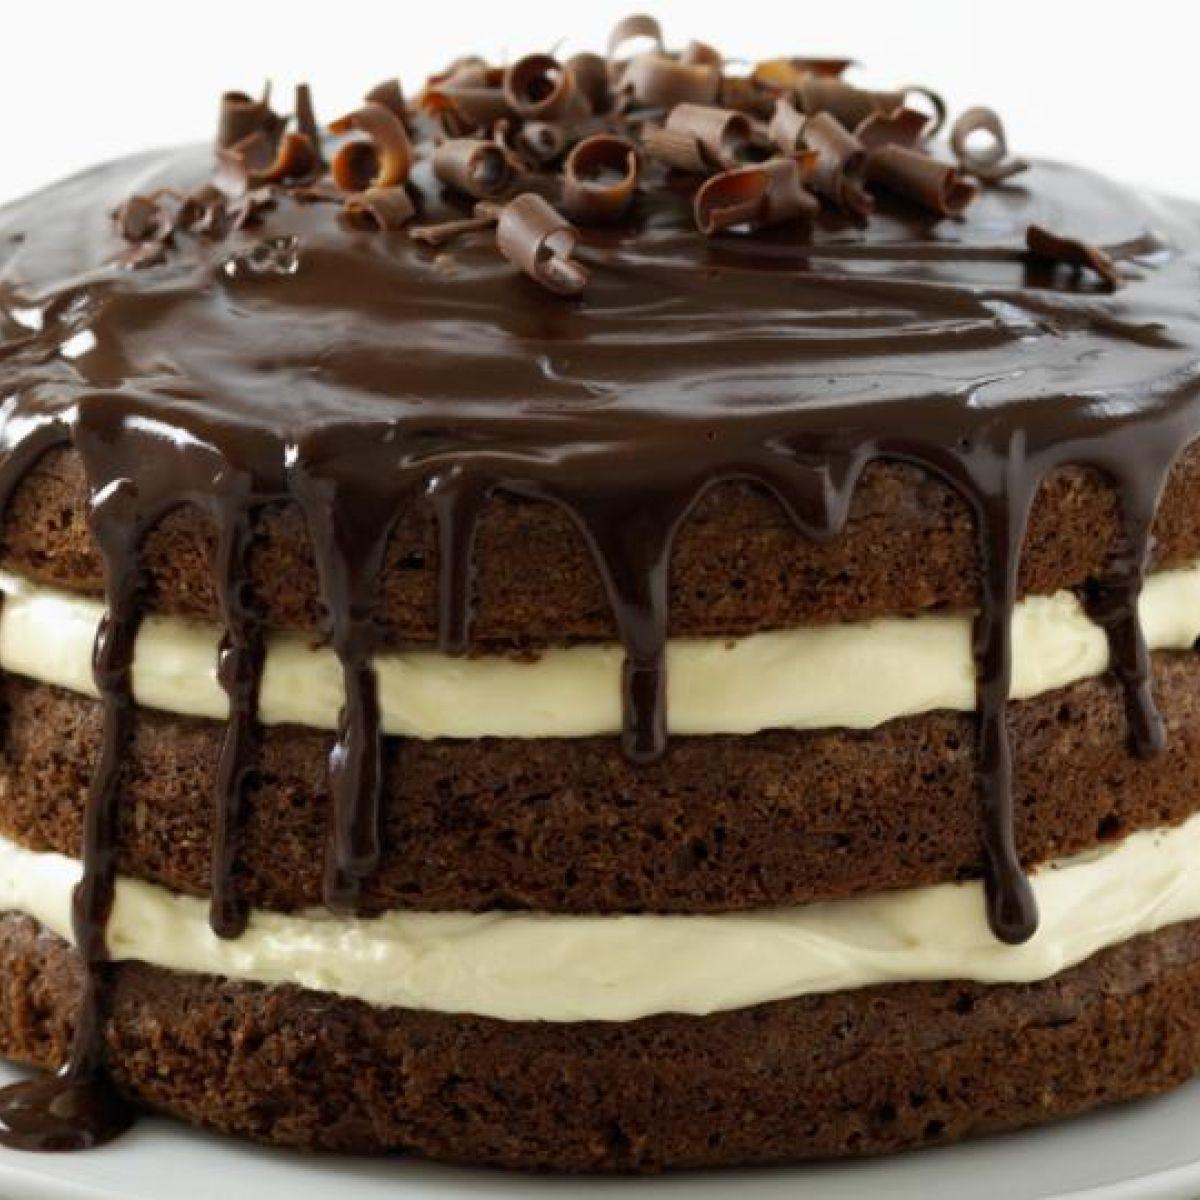 I Hate Cake Birthday Cake Wedding Cake Feckin Christmas Cake